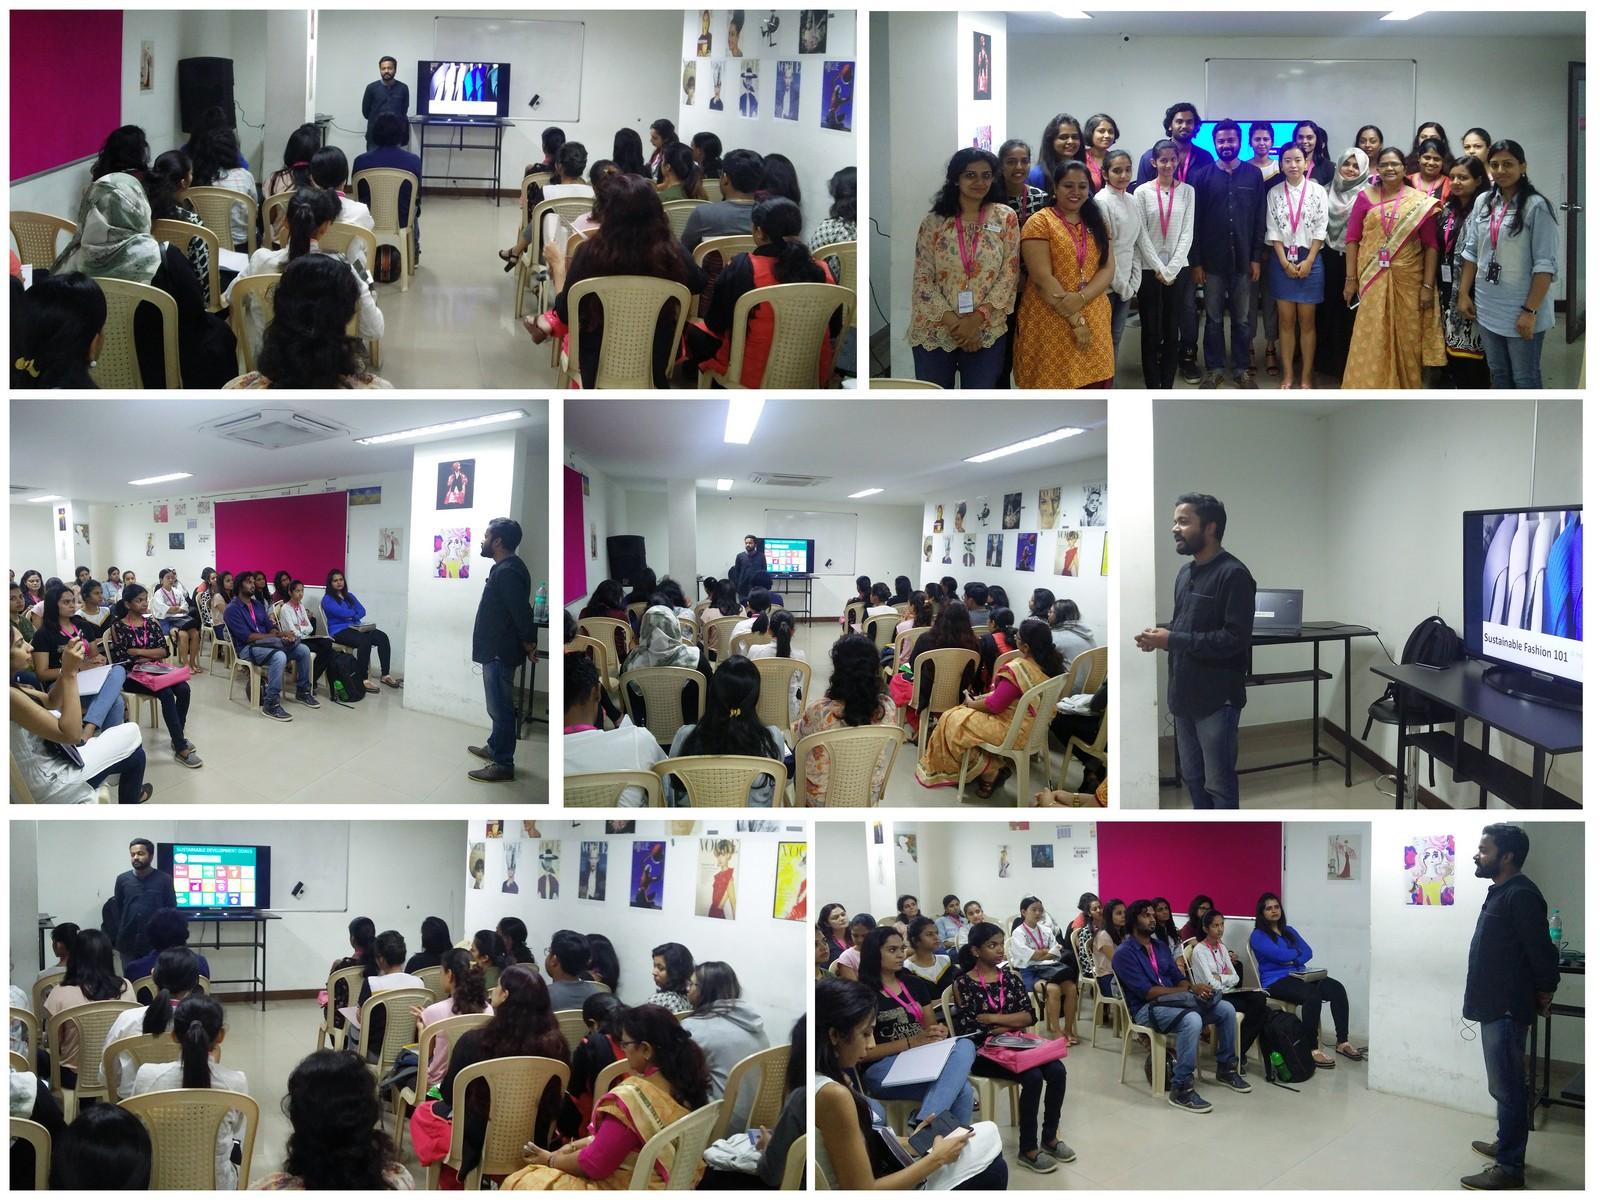 Dhawal Mane Talk Section talk on sustainability - dhawal mane - Dhawal Mane Talk Section - Talk on Sustainability – Dhawal Mane | JD Institute